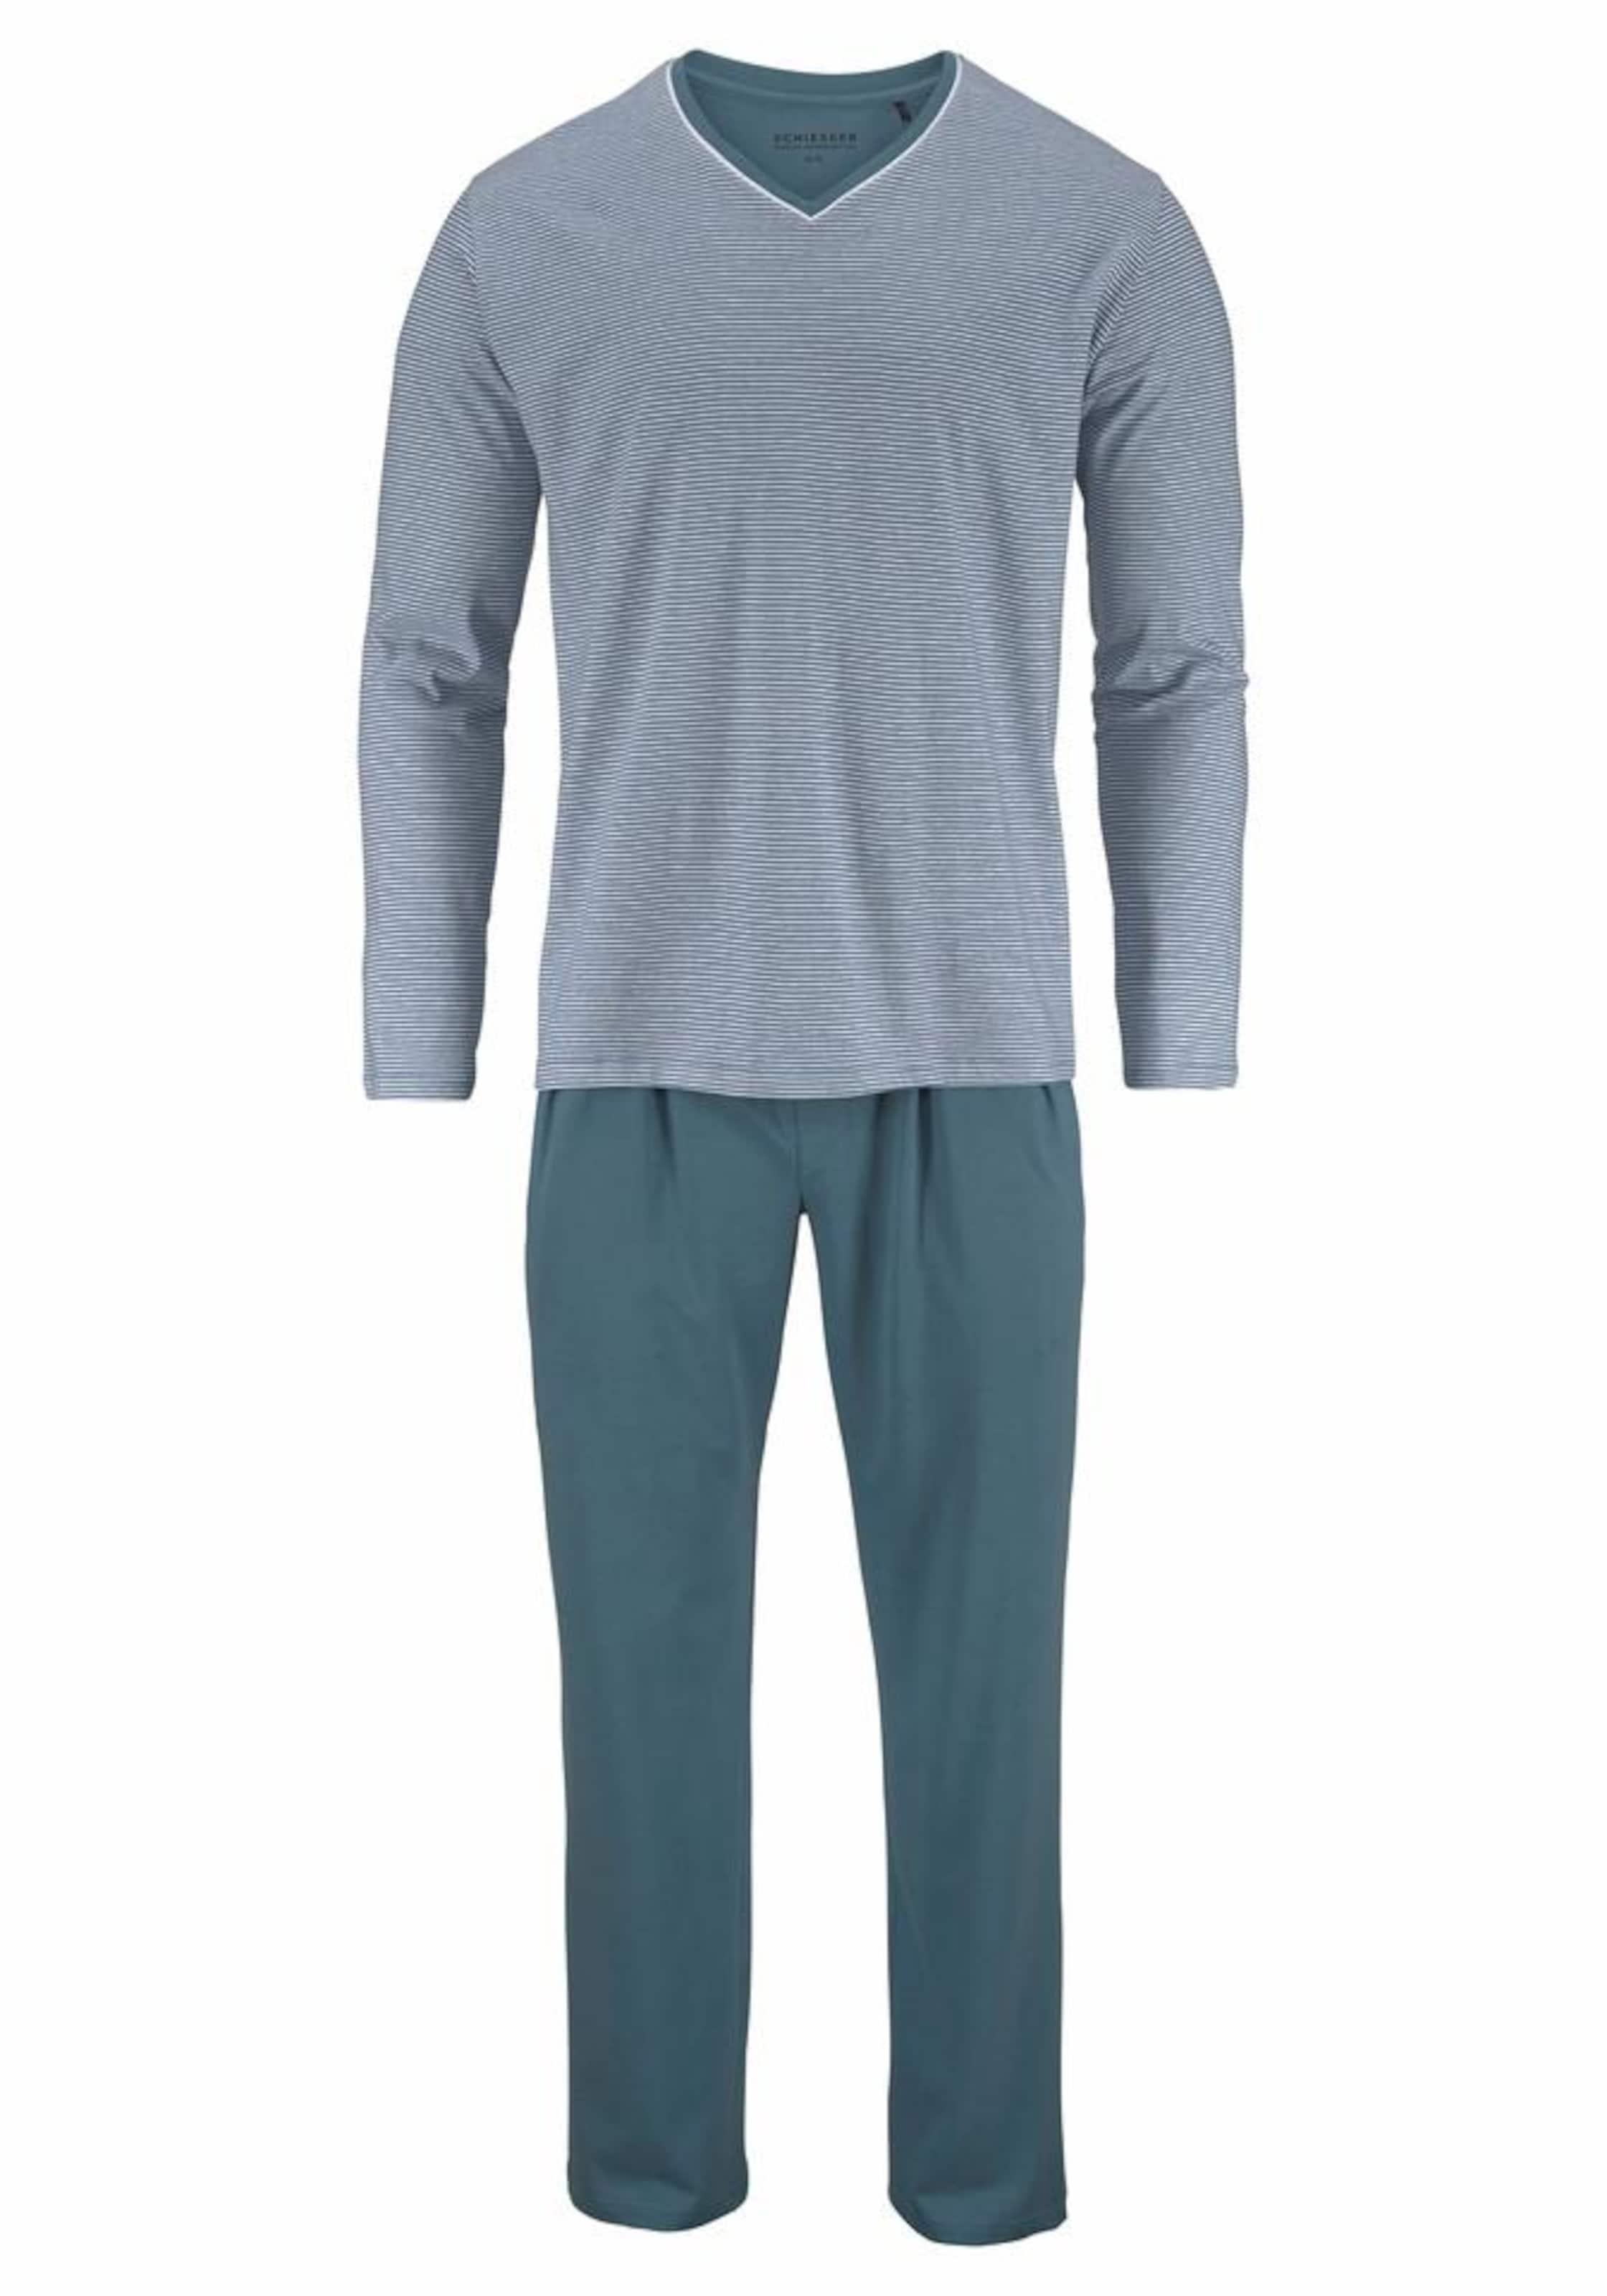 Pyjama Lang PastellblauGrau Pyjama Lang In Schiesser Schiesser In TKF1Jcl